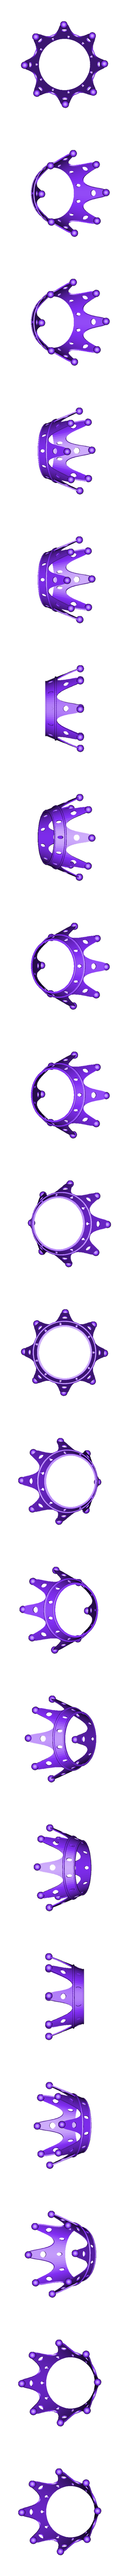 crown.stl Download free STL file Simple crown • 3D printable model, poblocki1982